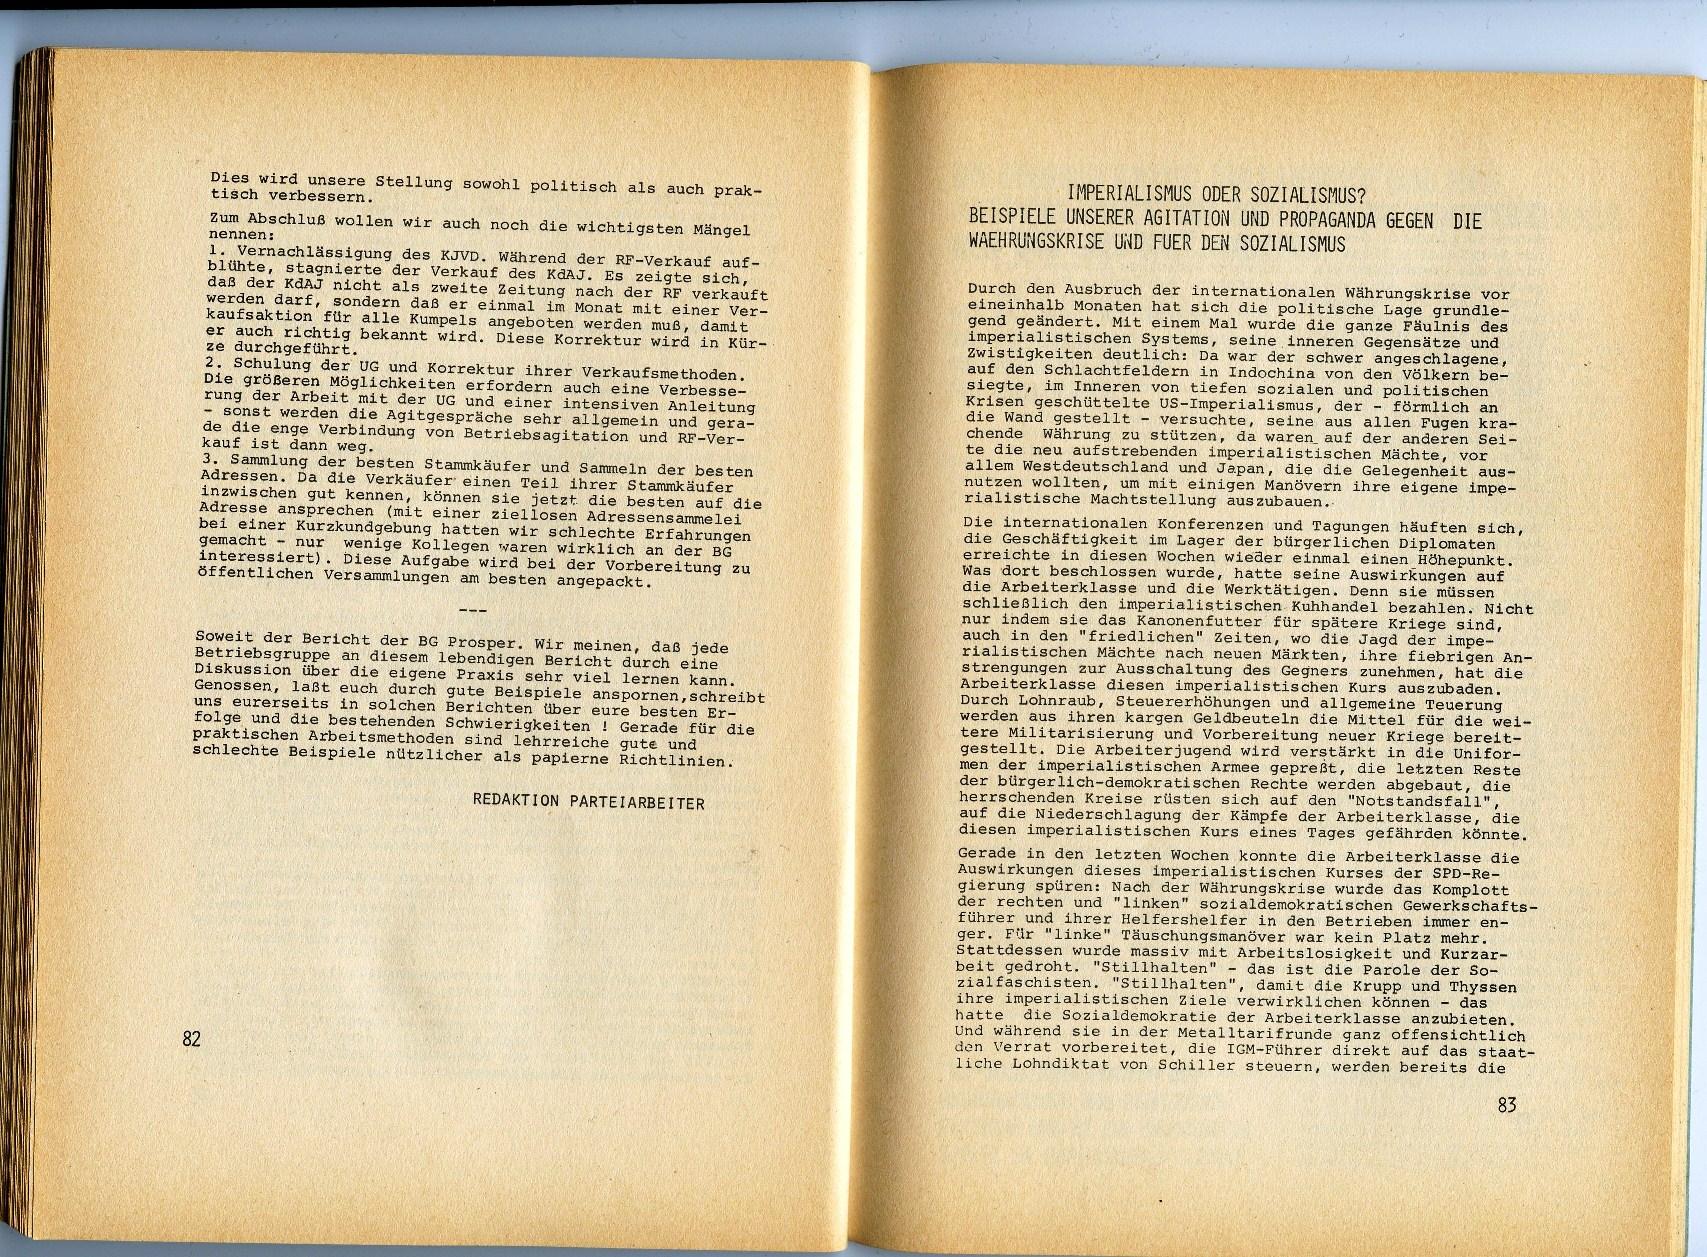 ZB_Parteiarbeiter_1971_08_43